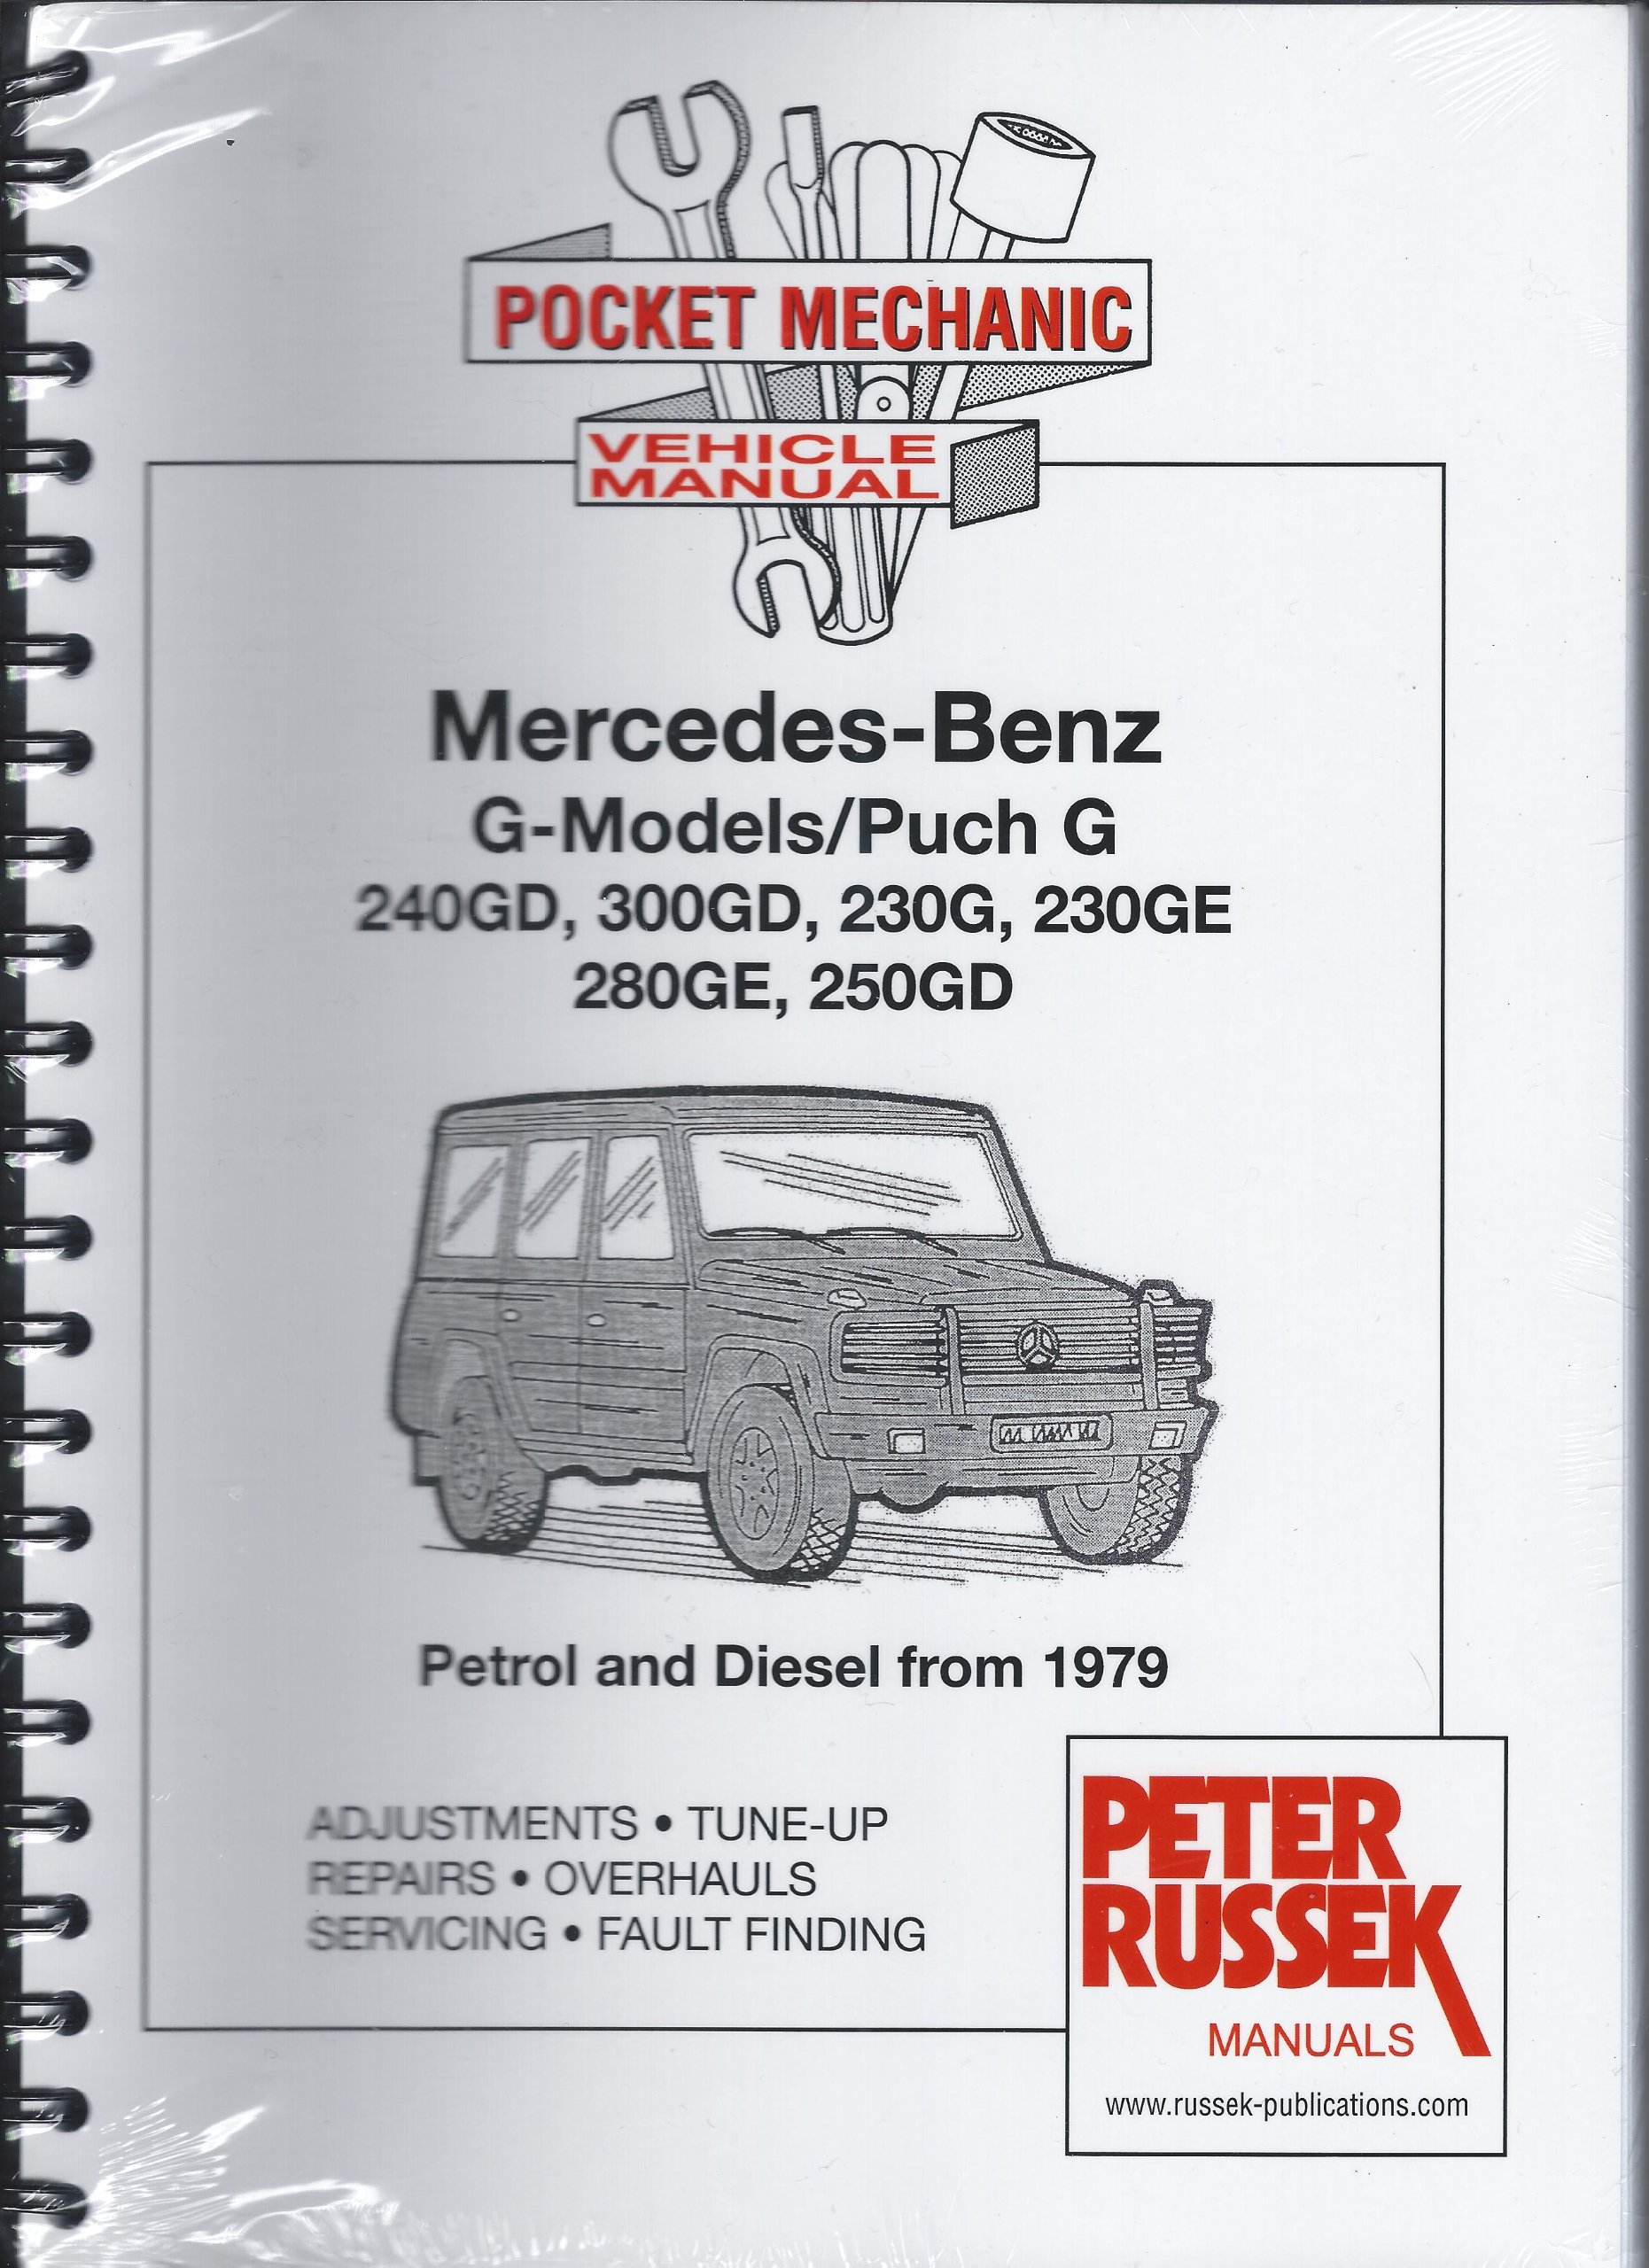 Mercedes Benz G Models Puch 240gd 300gd 230g 230ge 280ge Wiring Diagram 250gd Petrol Diesel From 1979 A4 Size Peter Russek Publications Ltd